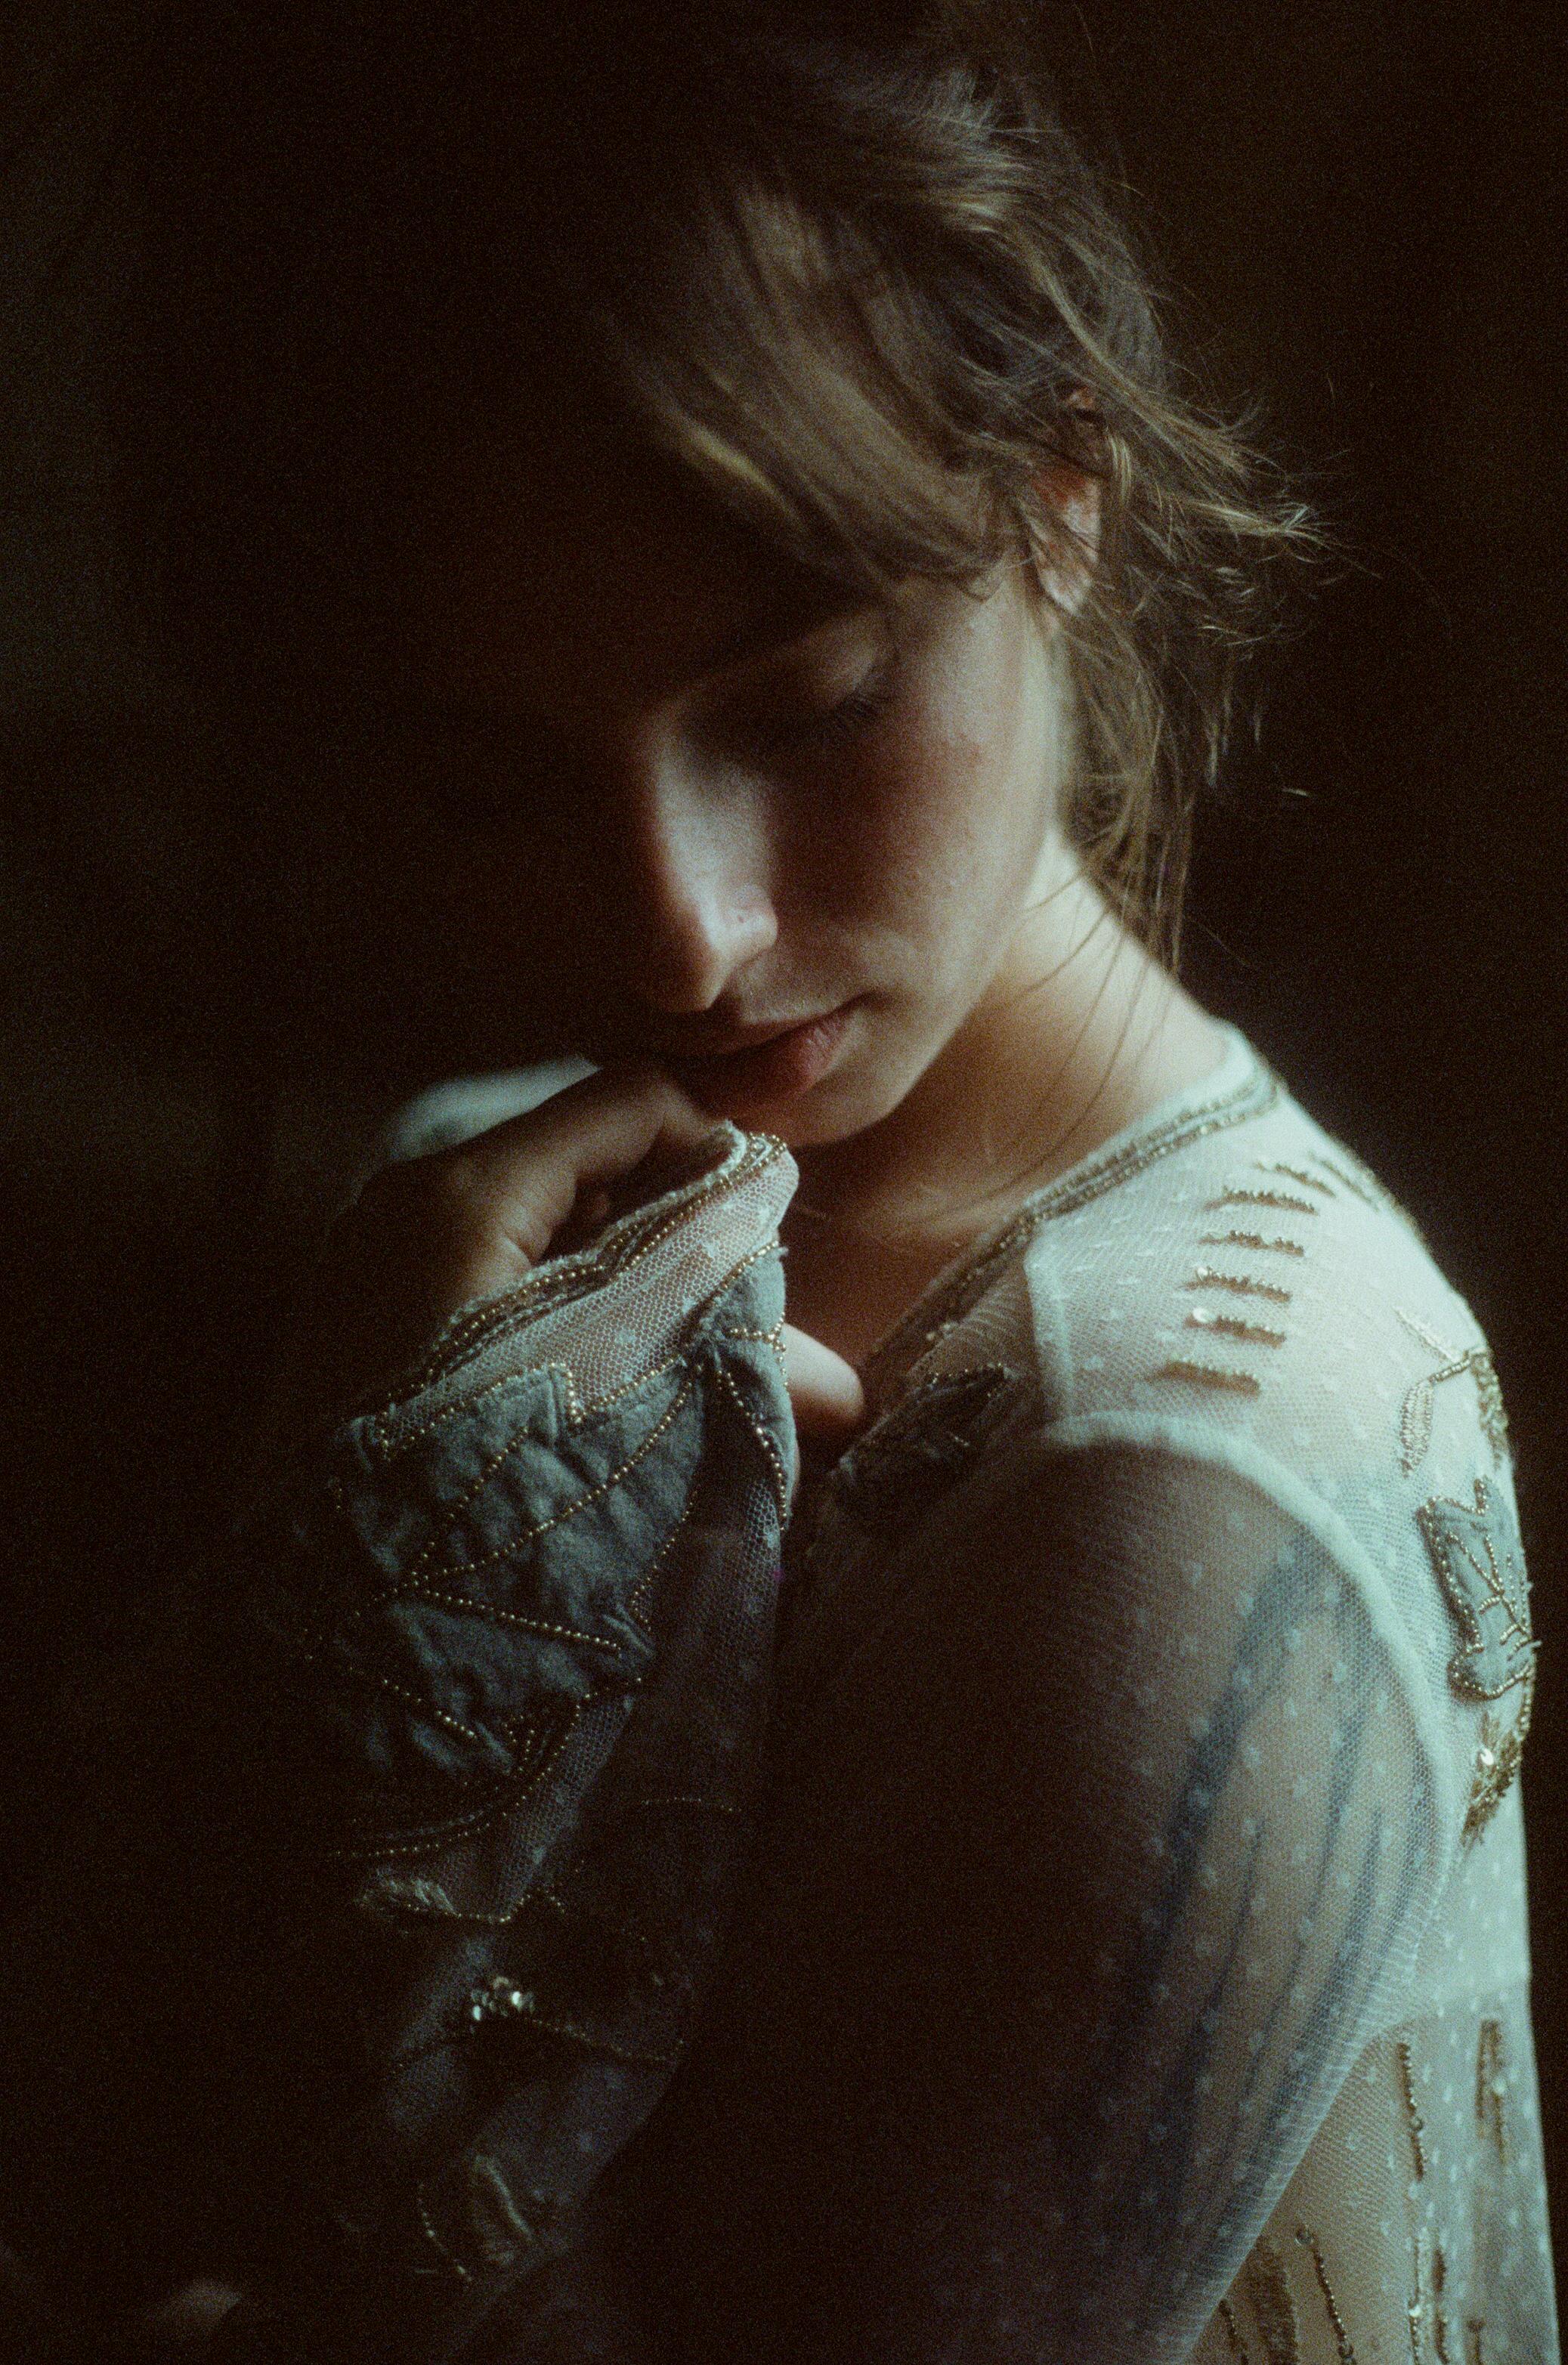 35mm film portrait. lingerie editorial. moody boudoir. canon ae-1. cinestill 800. moody portrait. emotional portrait. ohio portrait photographer. sarah rose photography. i am sarah rose.